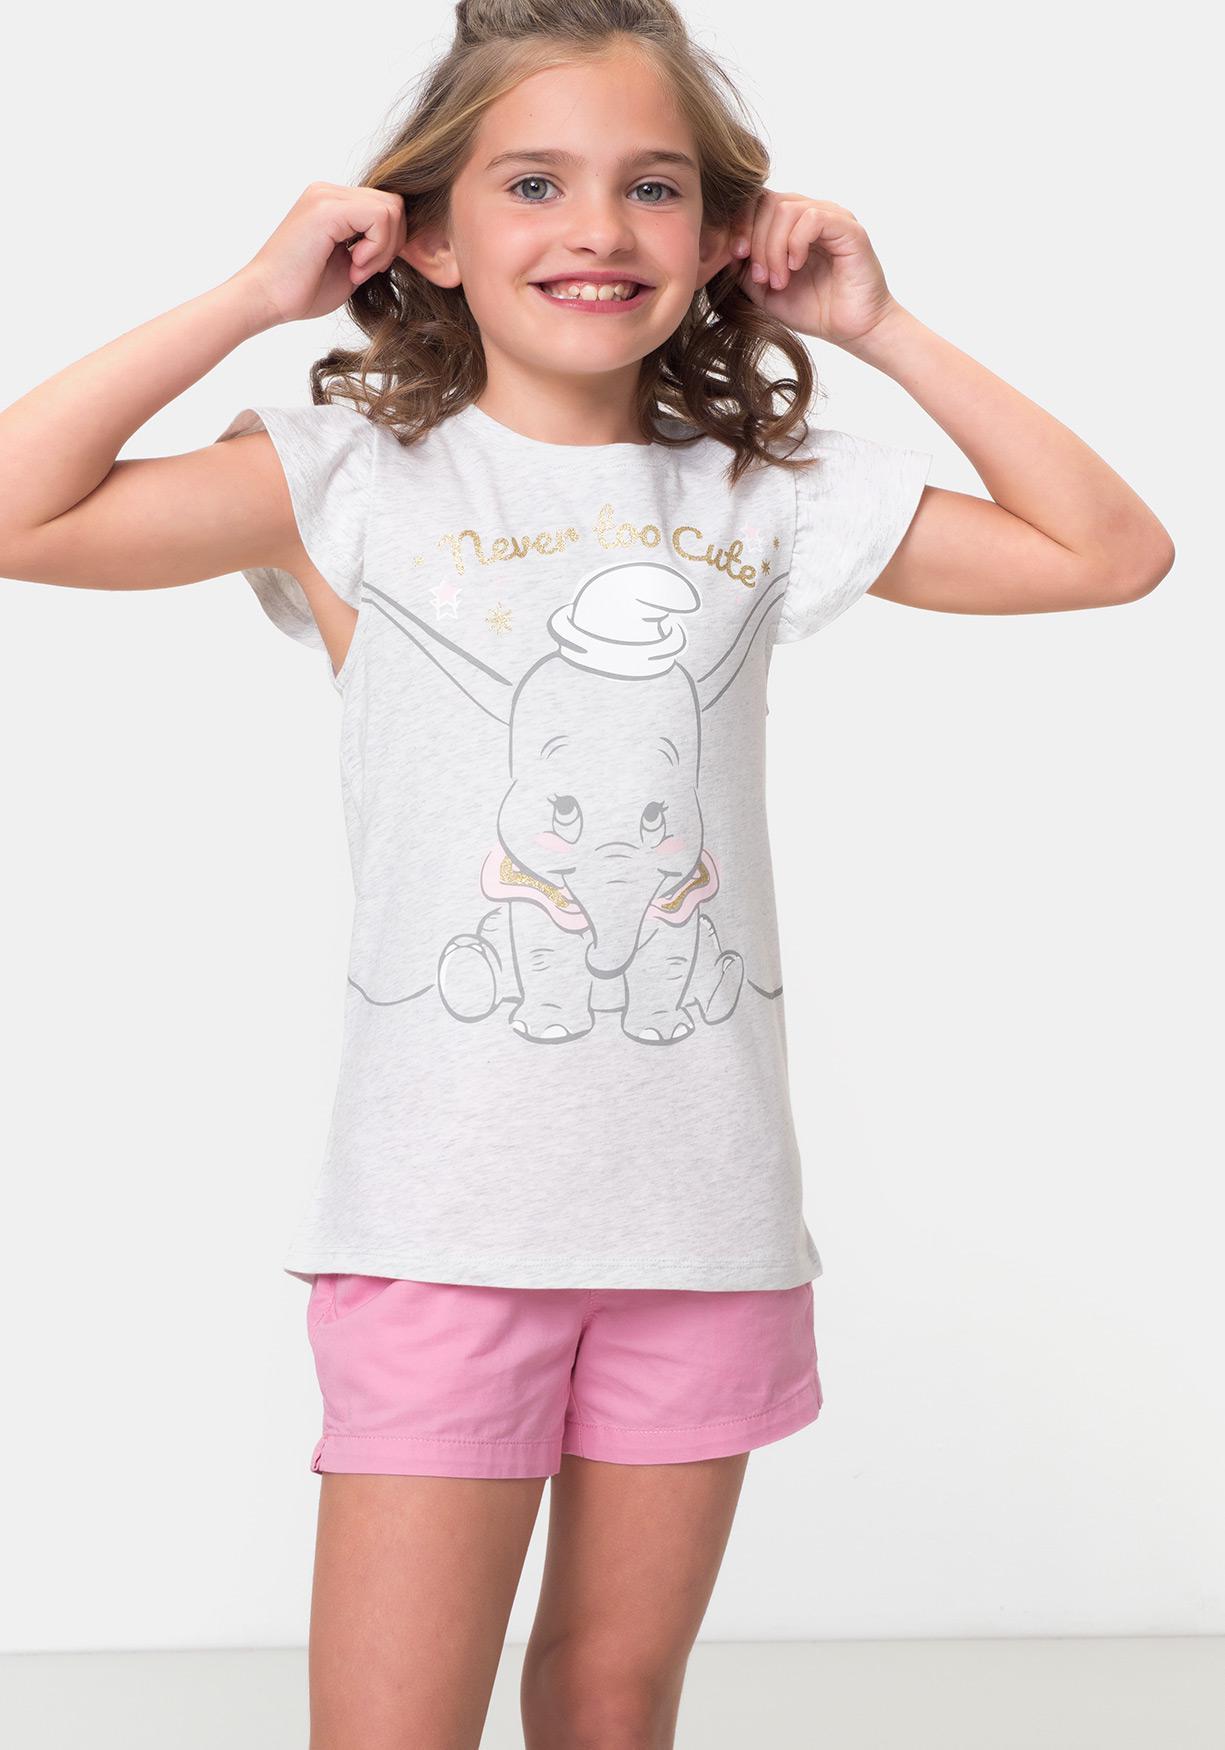 409b41b4d Comprar Camiseta de manga corta Dumbo de DISNEY. ¡Aprovéchate de ...